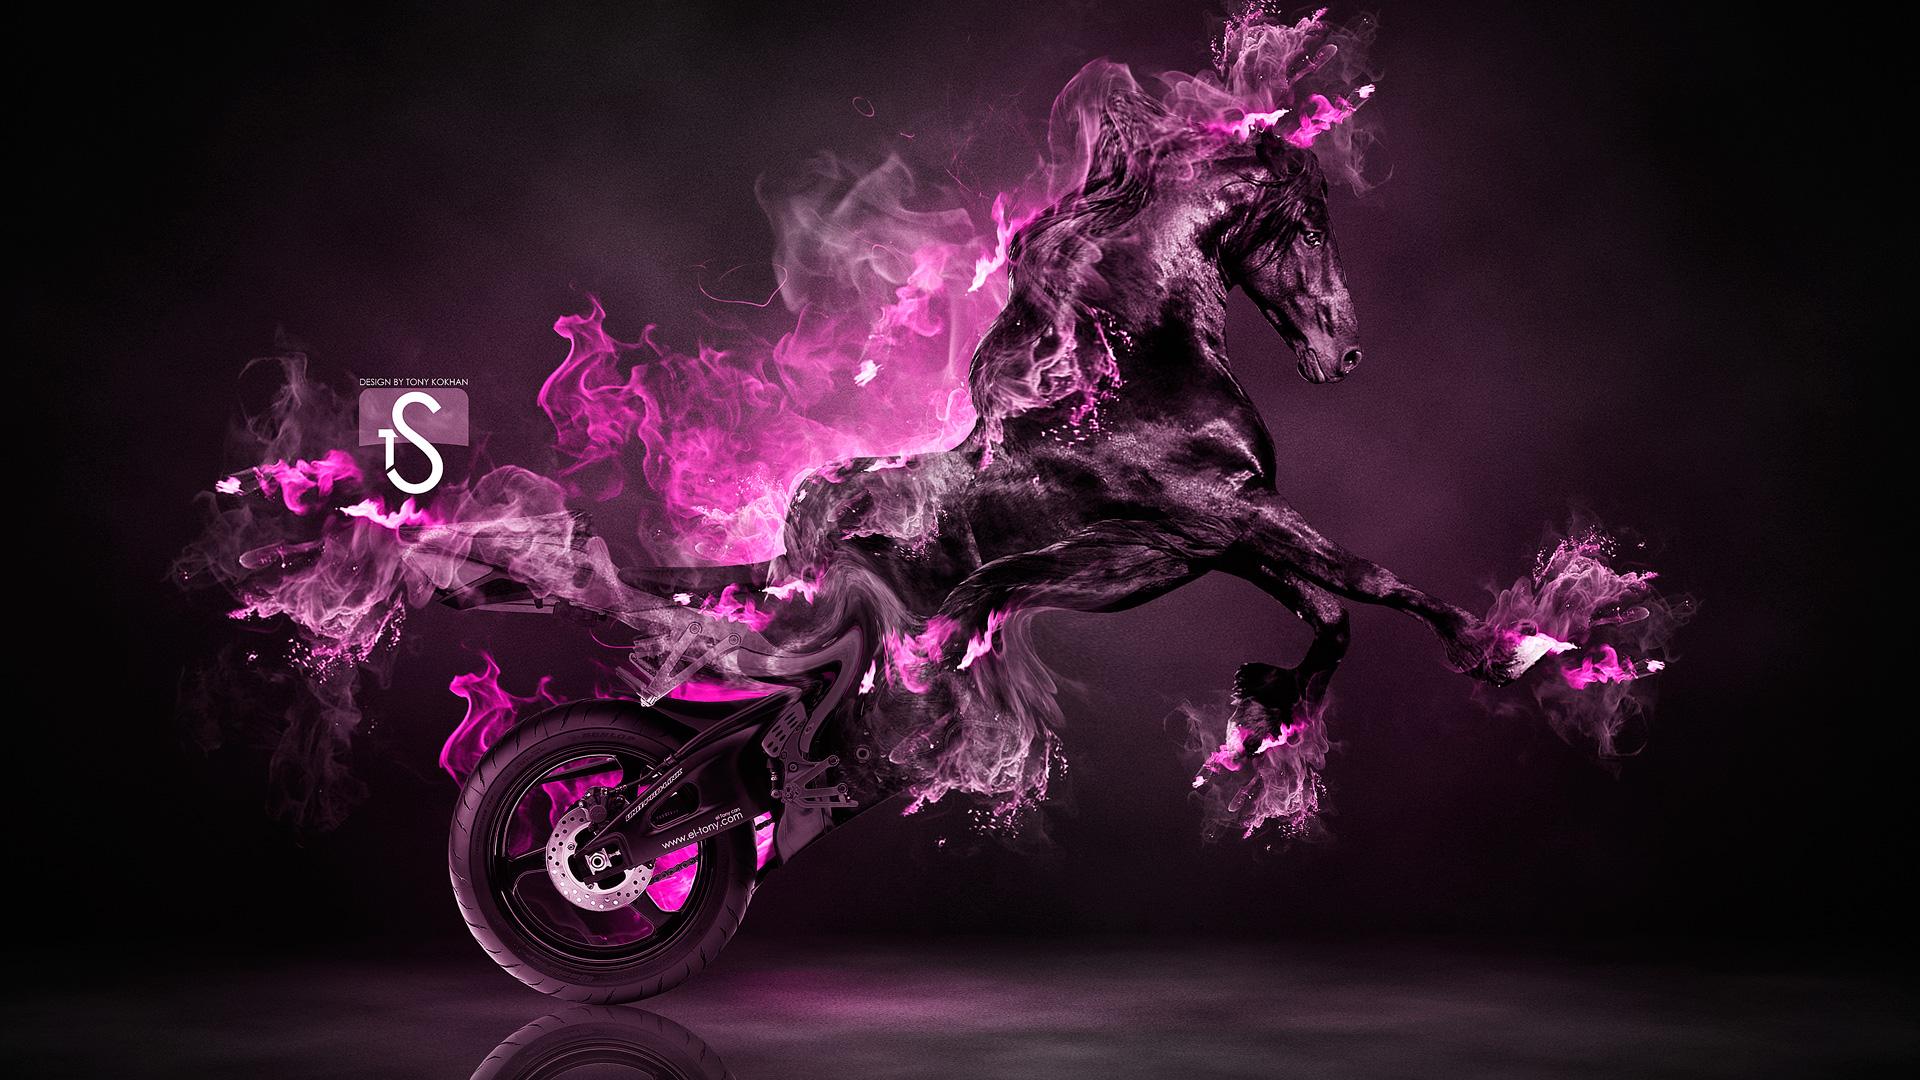 Pink HD Wallpaper   Wallpaper High Definition High Quality 1920x1080